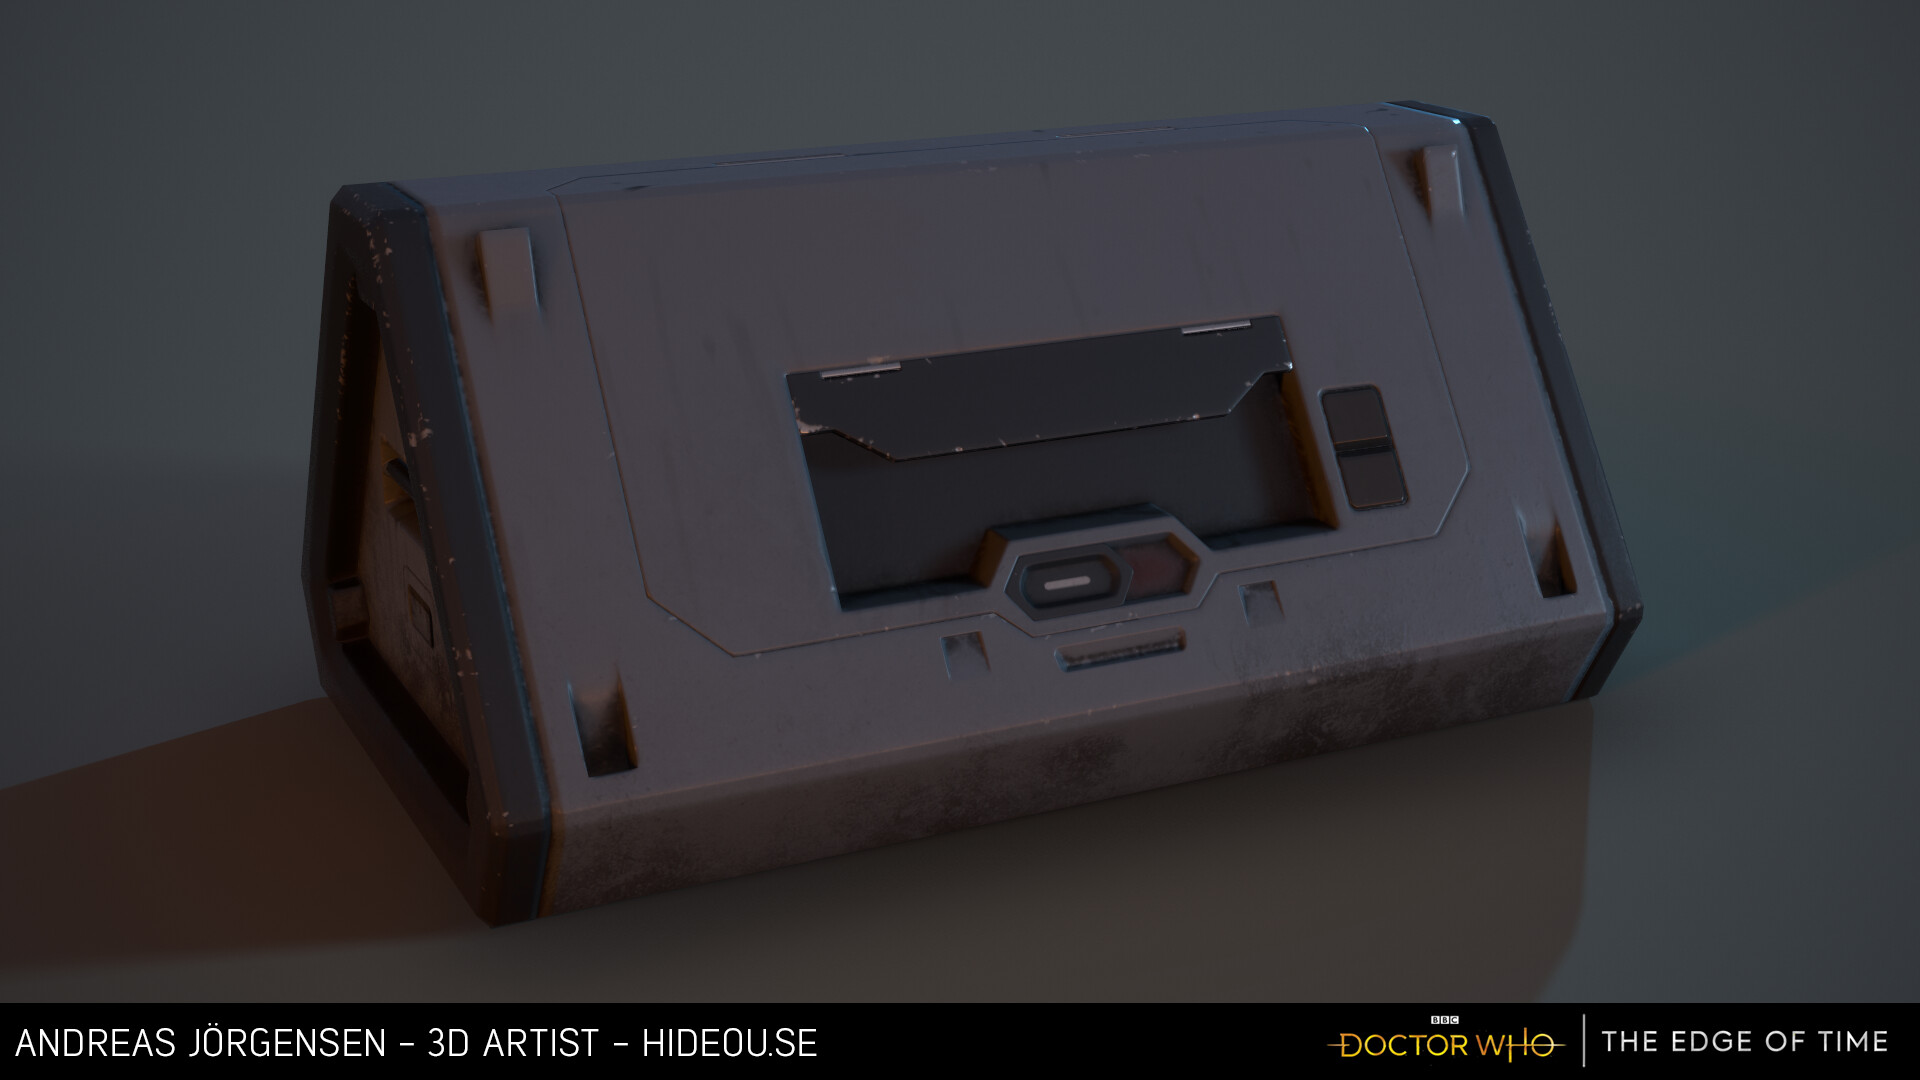 Andreas jorgensen crate1